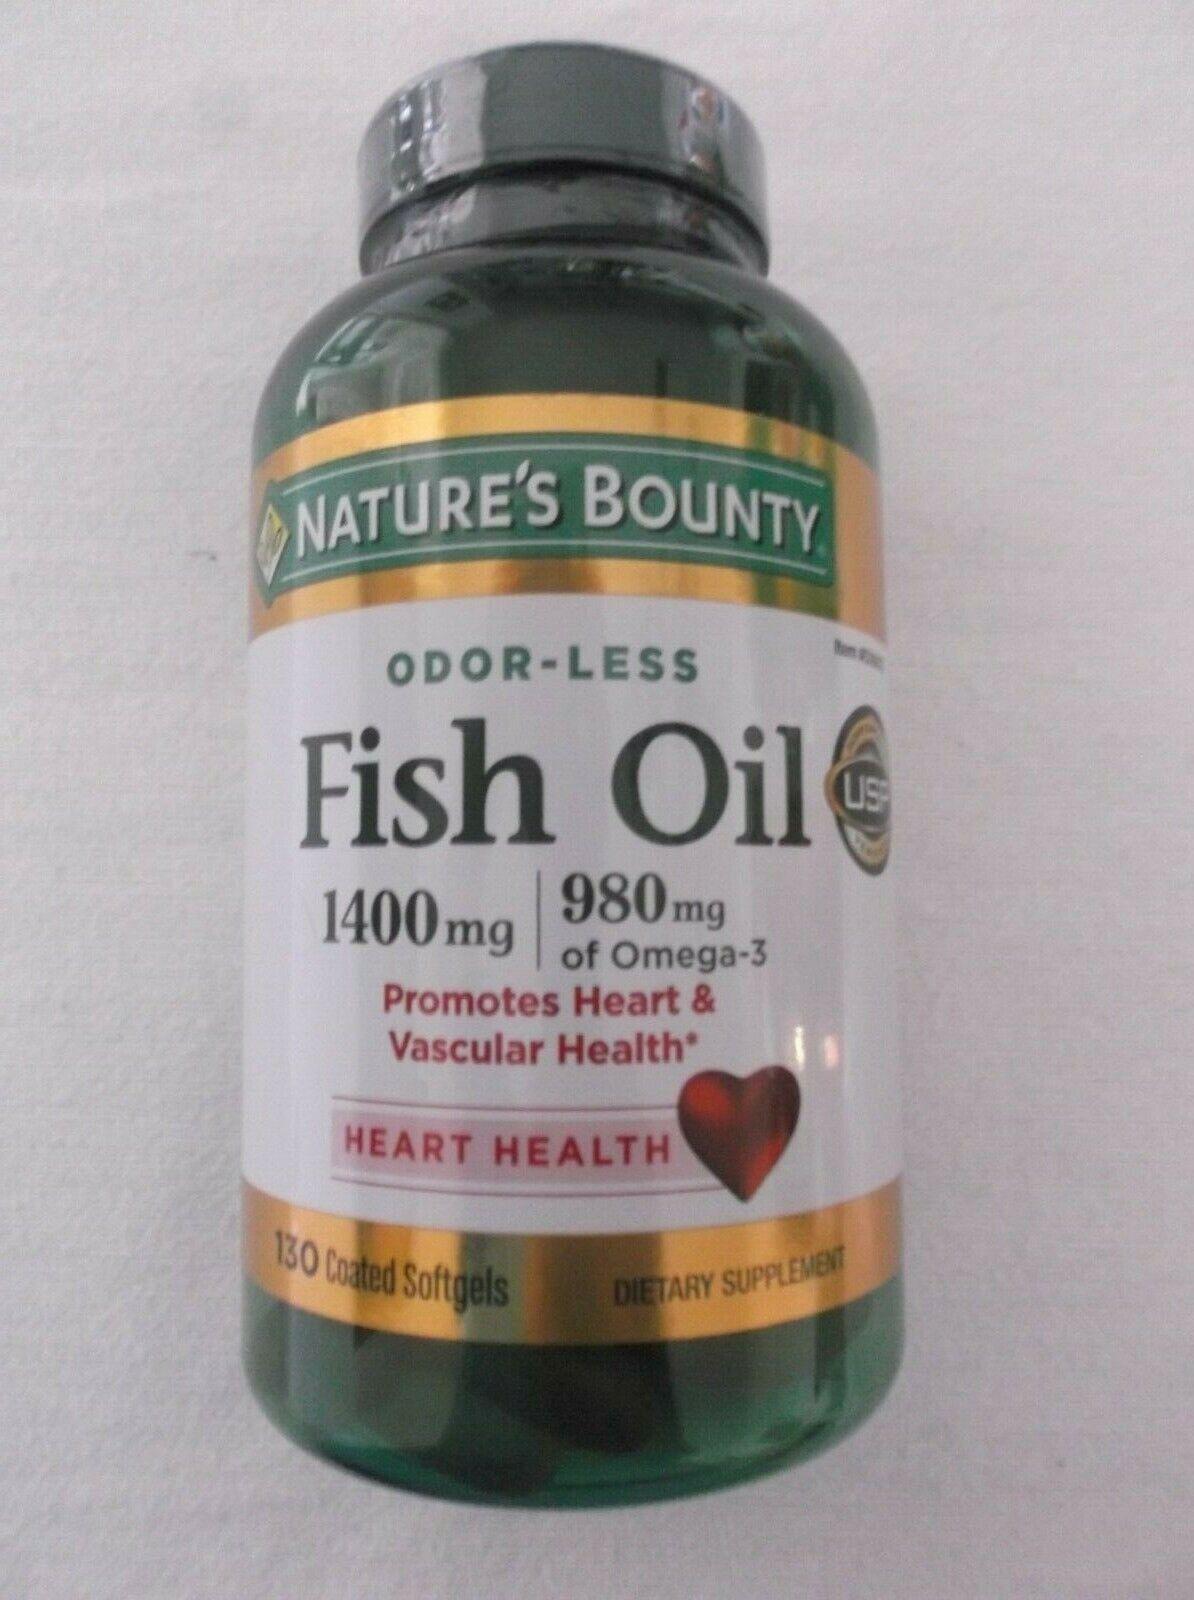 Nature's Bounty ODOR-LESS Fish Oil 1400mg, 980mg Omega-3 130